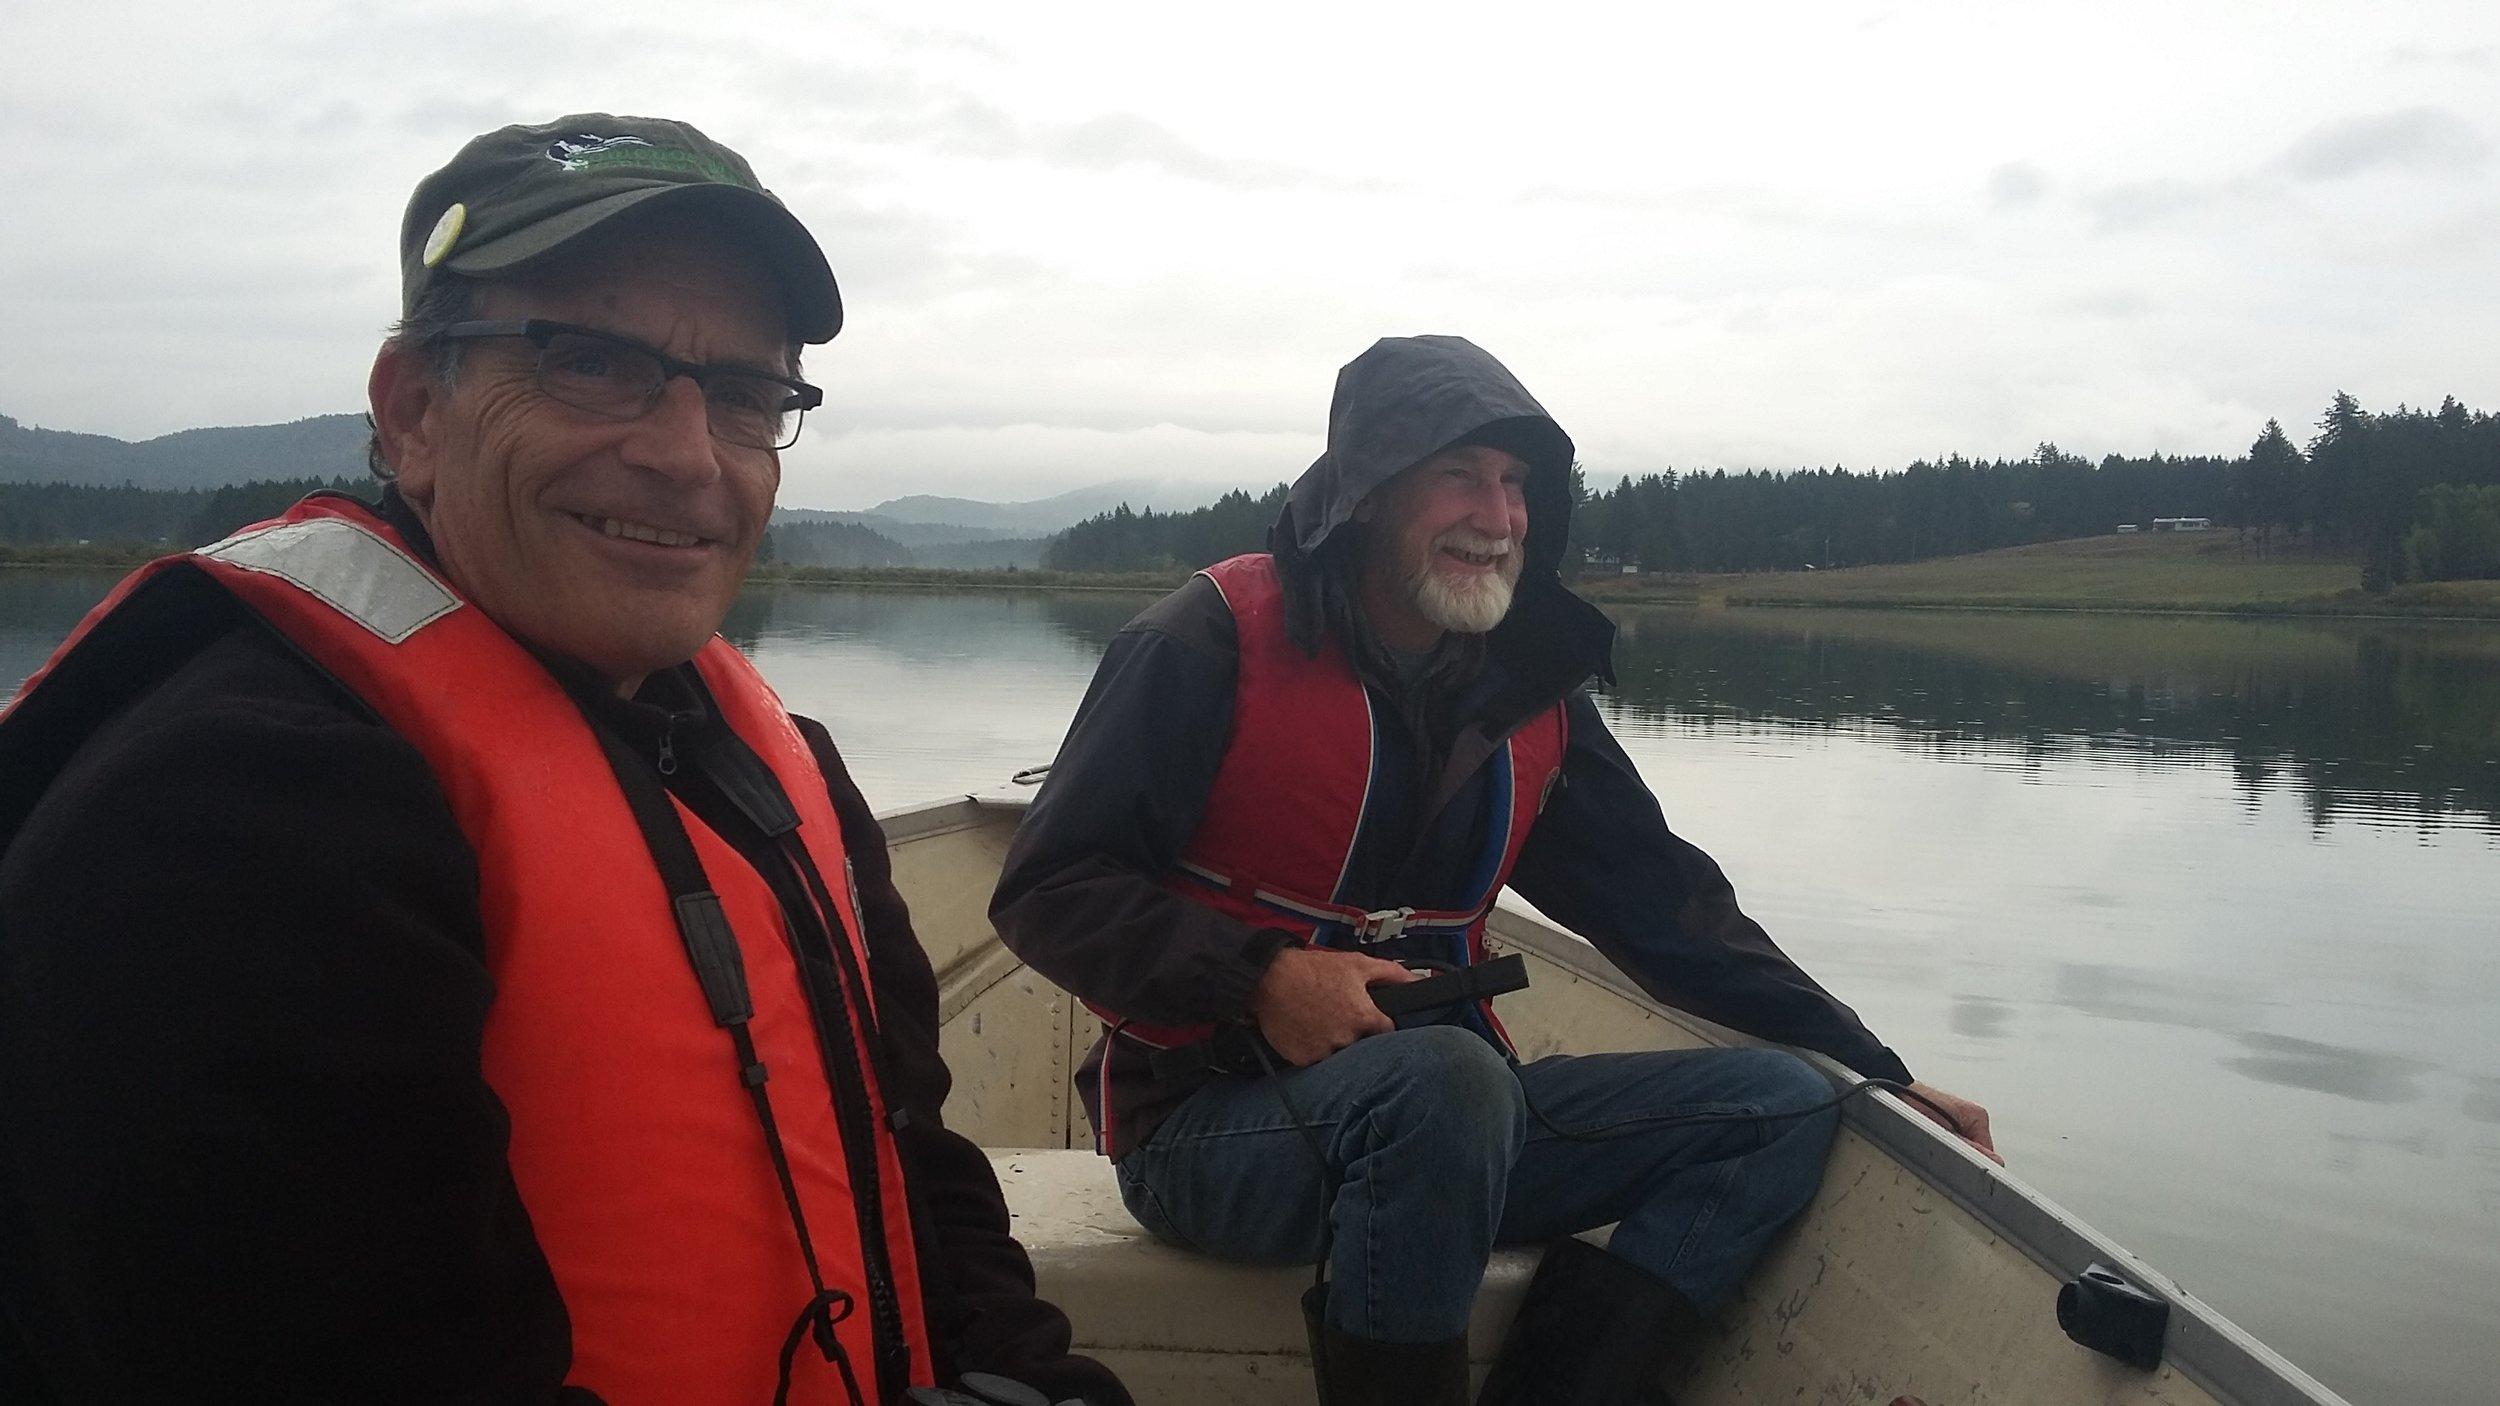 Water quality monitoring on Somenos Lake - Photo by Elizabeth Aitken